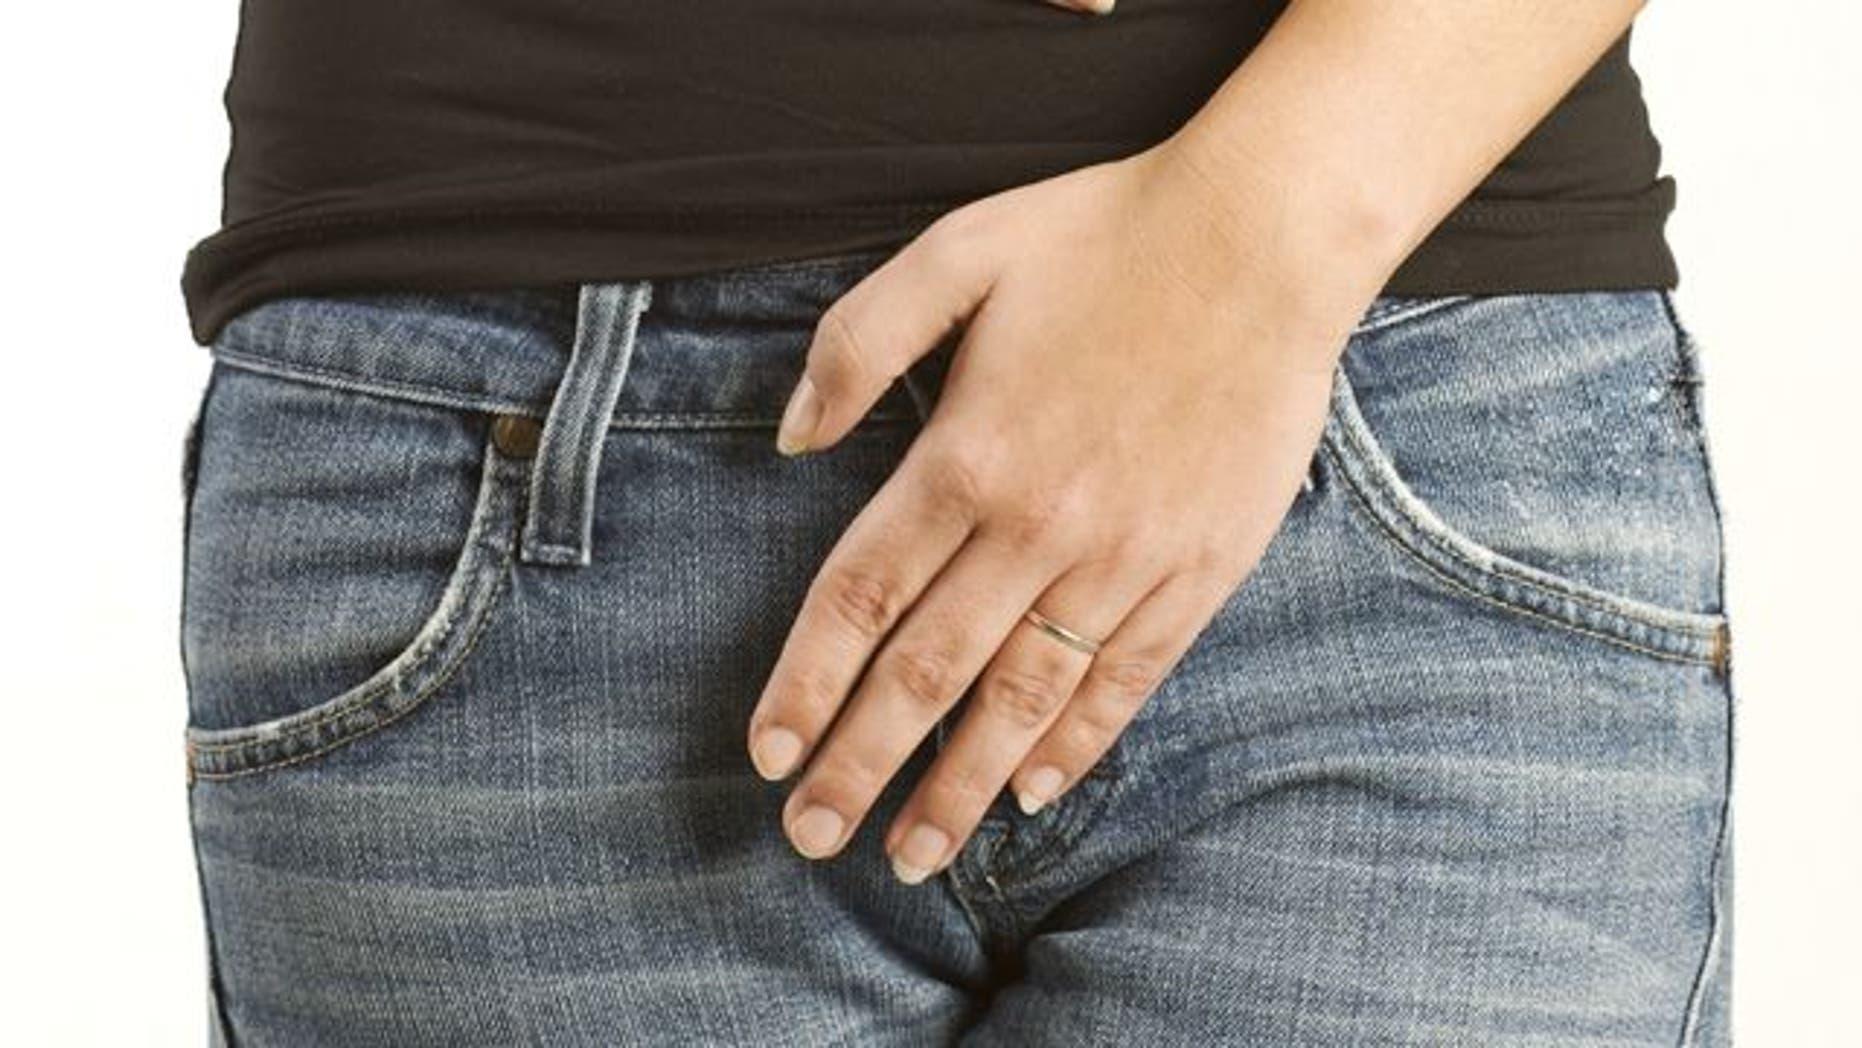 Think, that Rub my clitoris on random objects new day